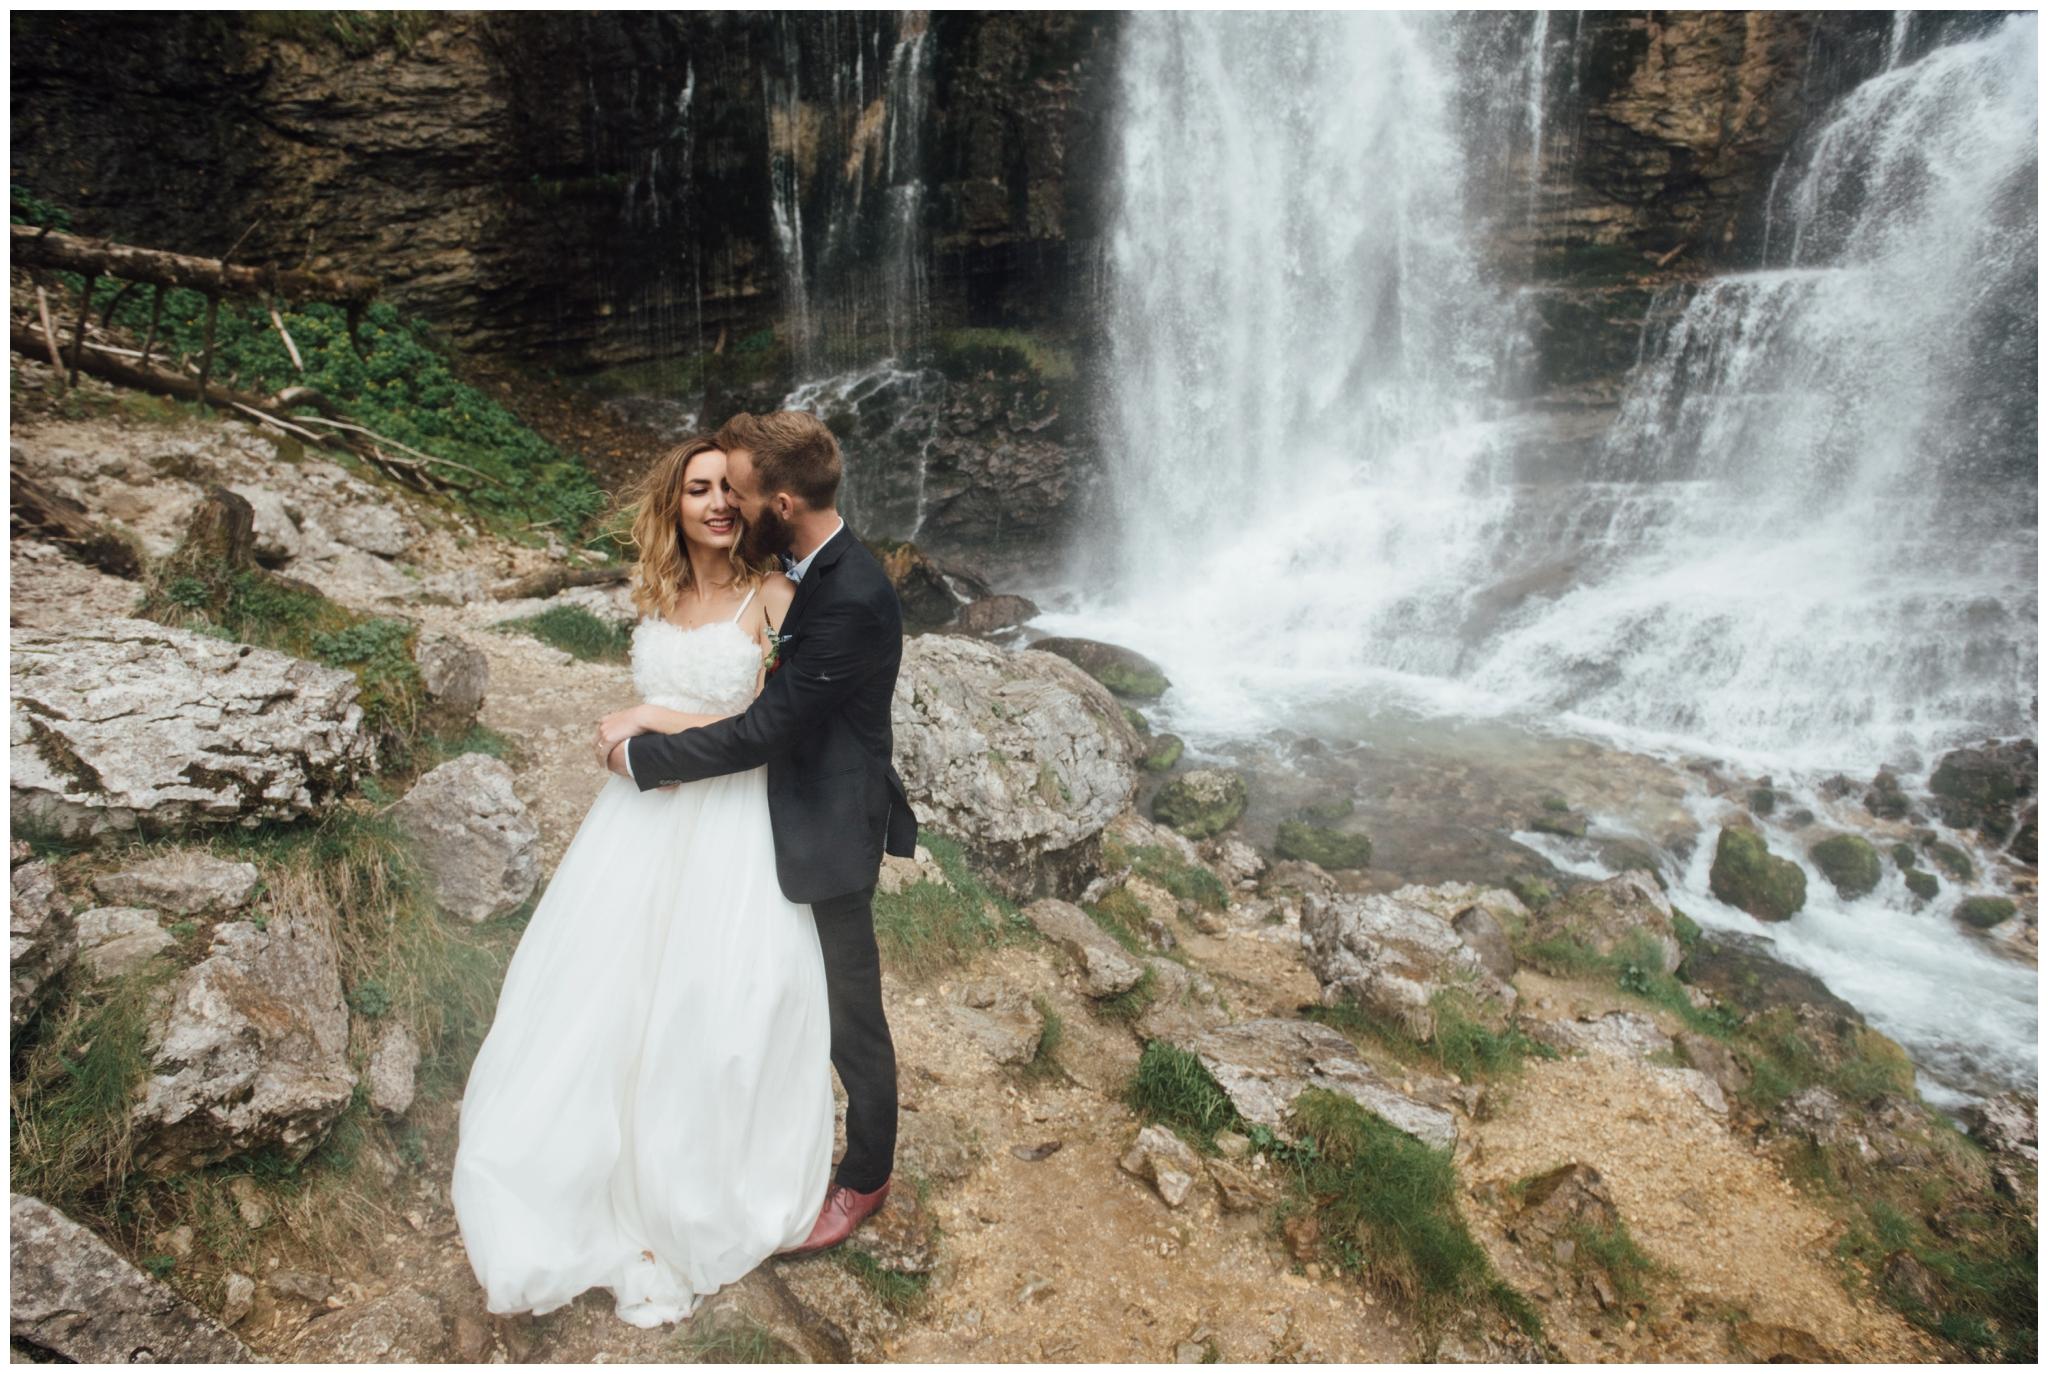 photographe-mariage-grenoble-annecy-lyon-shooting-inspiration-boheme-036